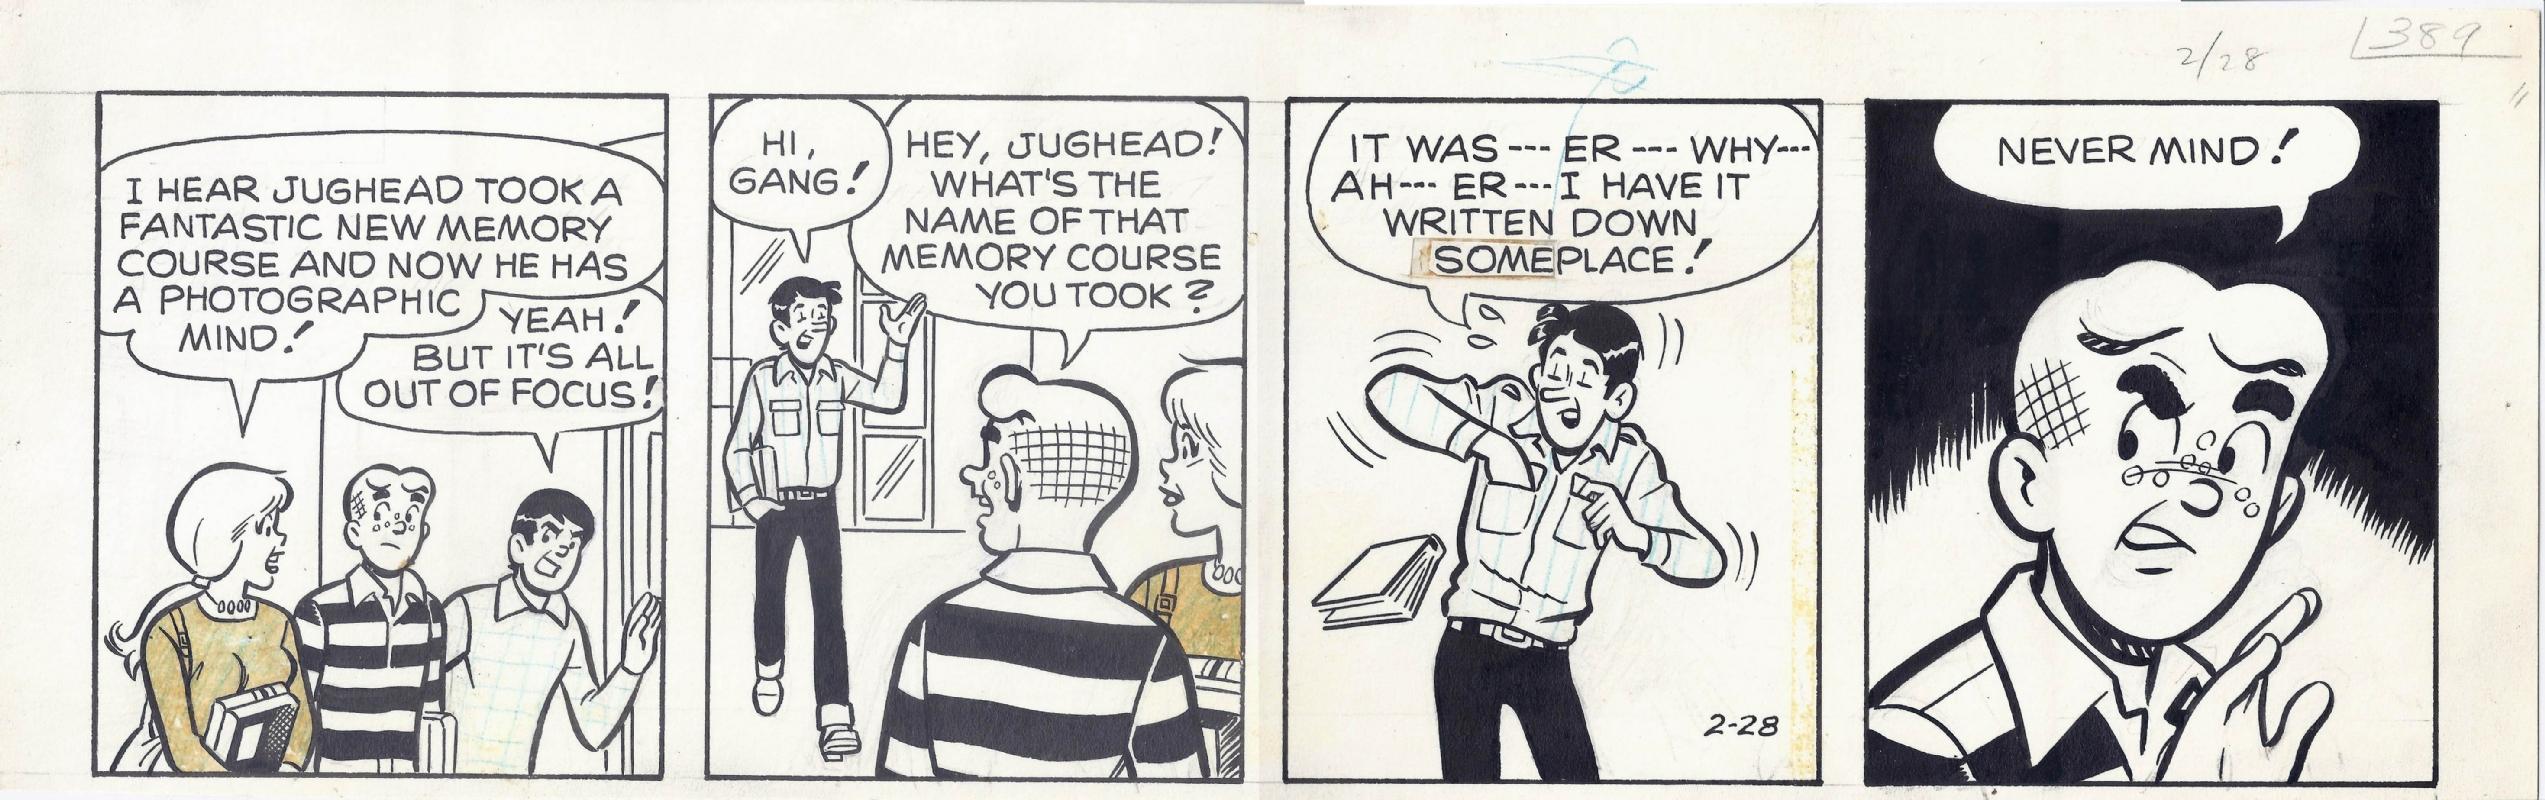 Archie comc strip